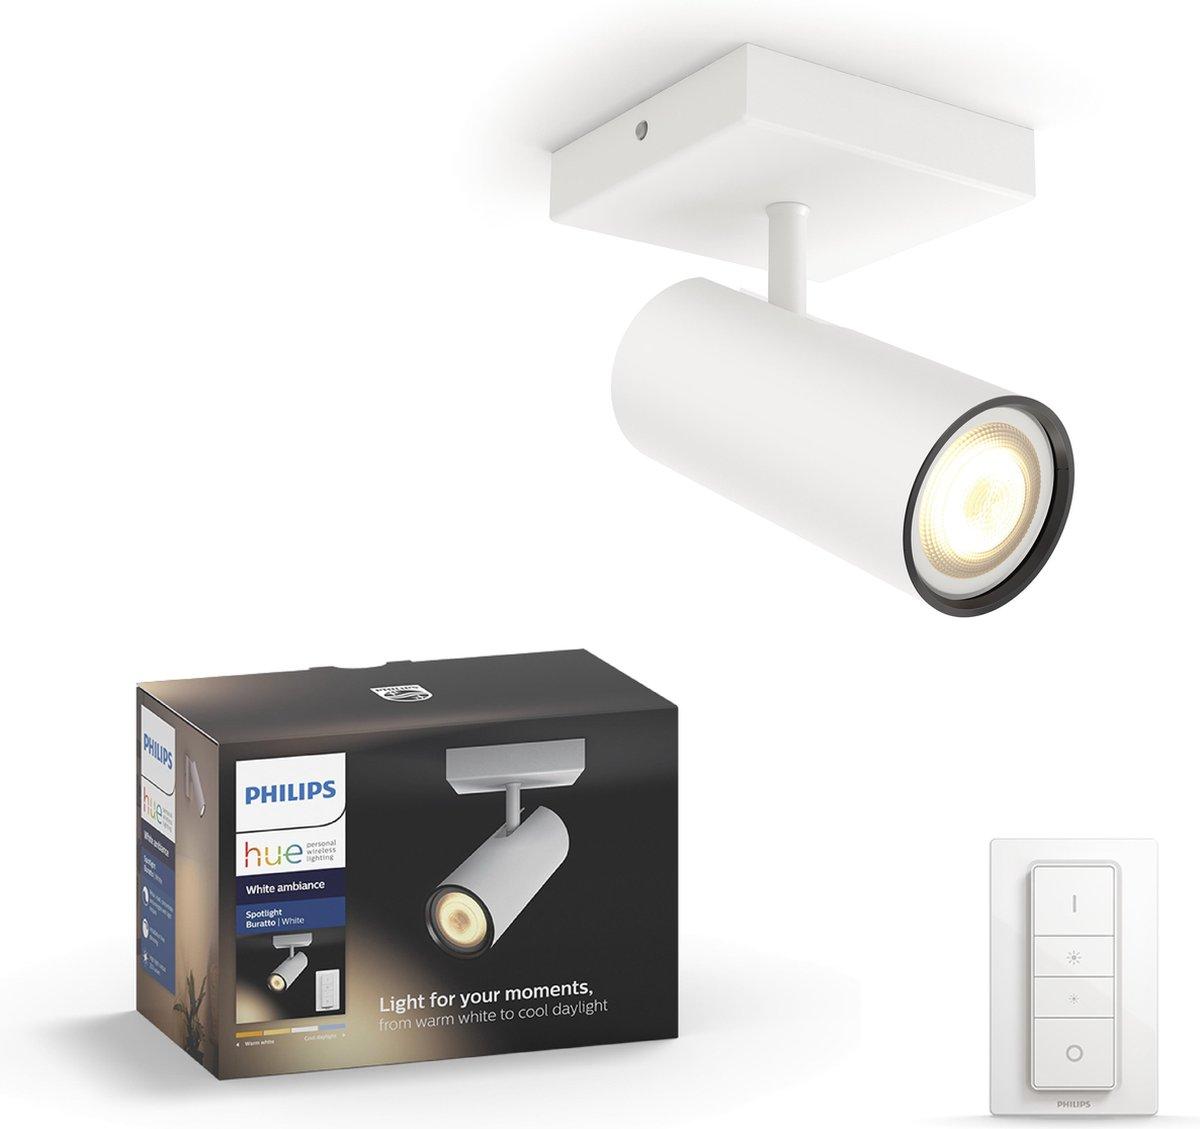 Philips Hue Buratto opbouwspot - warm tot koelwit licht - 1-lichts - wit - basis